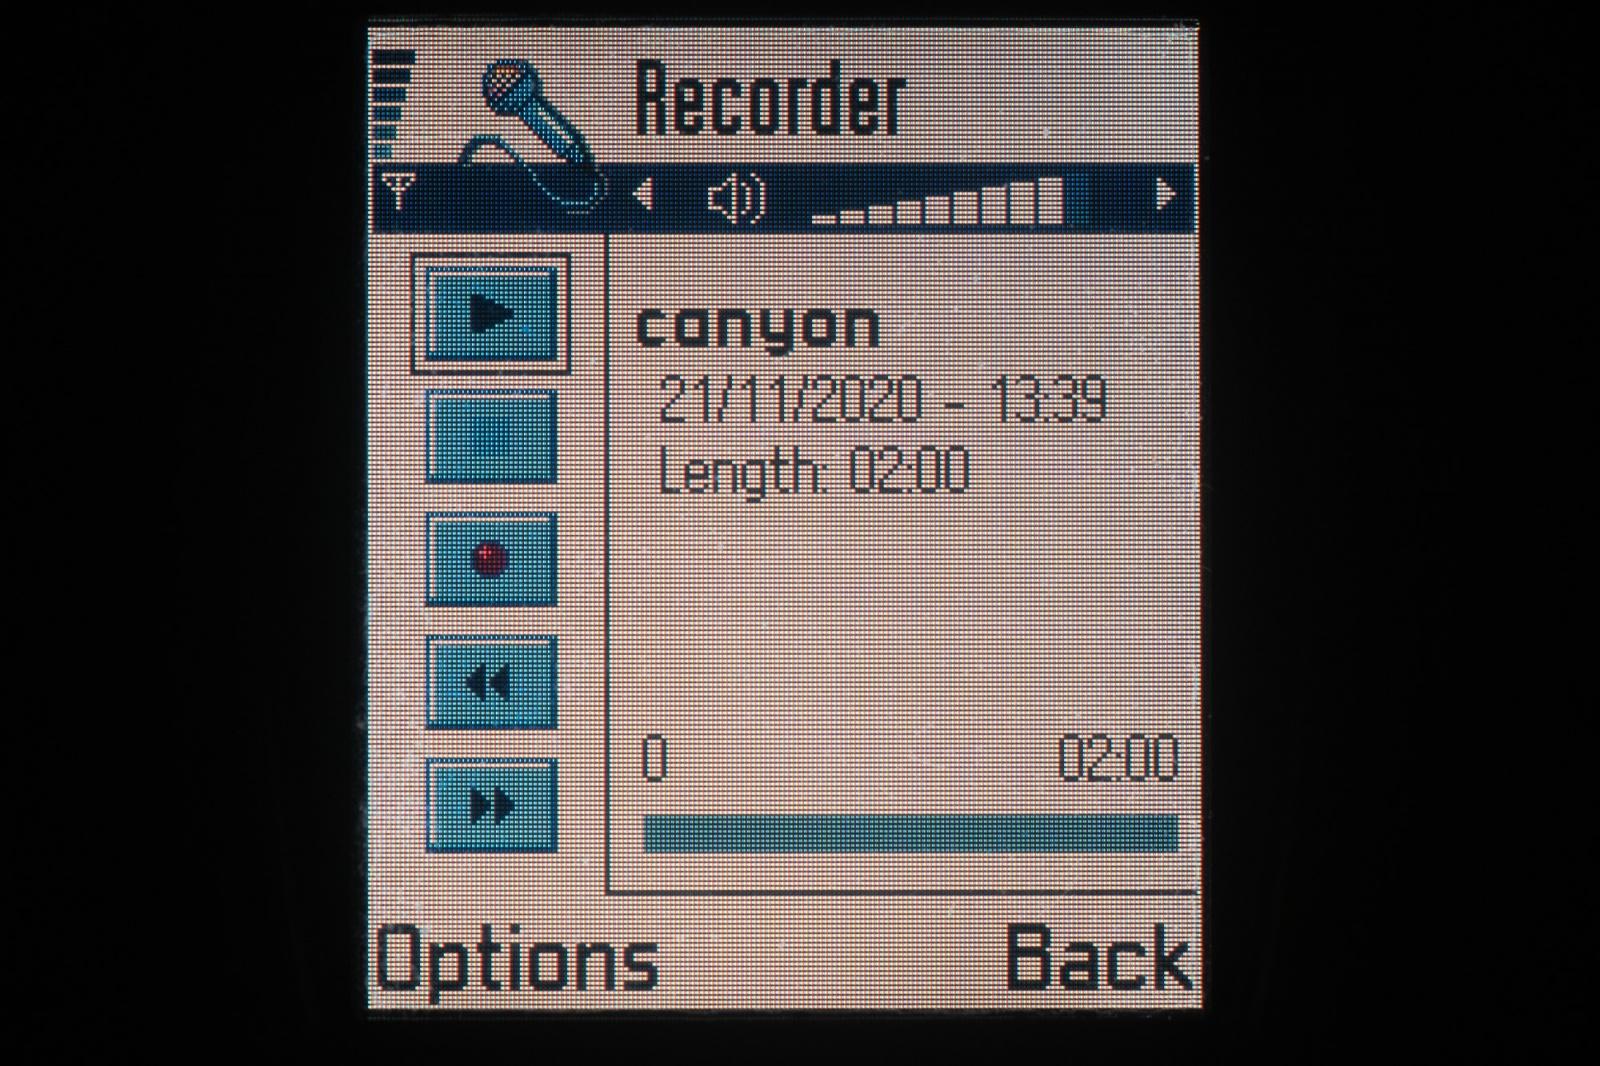 Nokia 7650 и начало эпохи смартфонов - 9